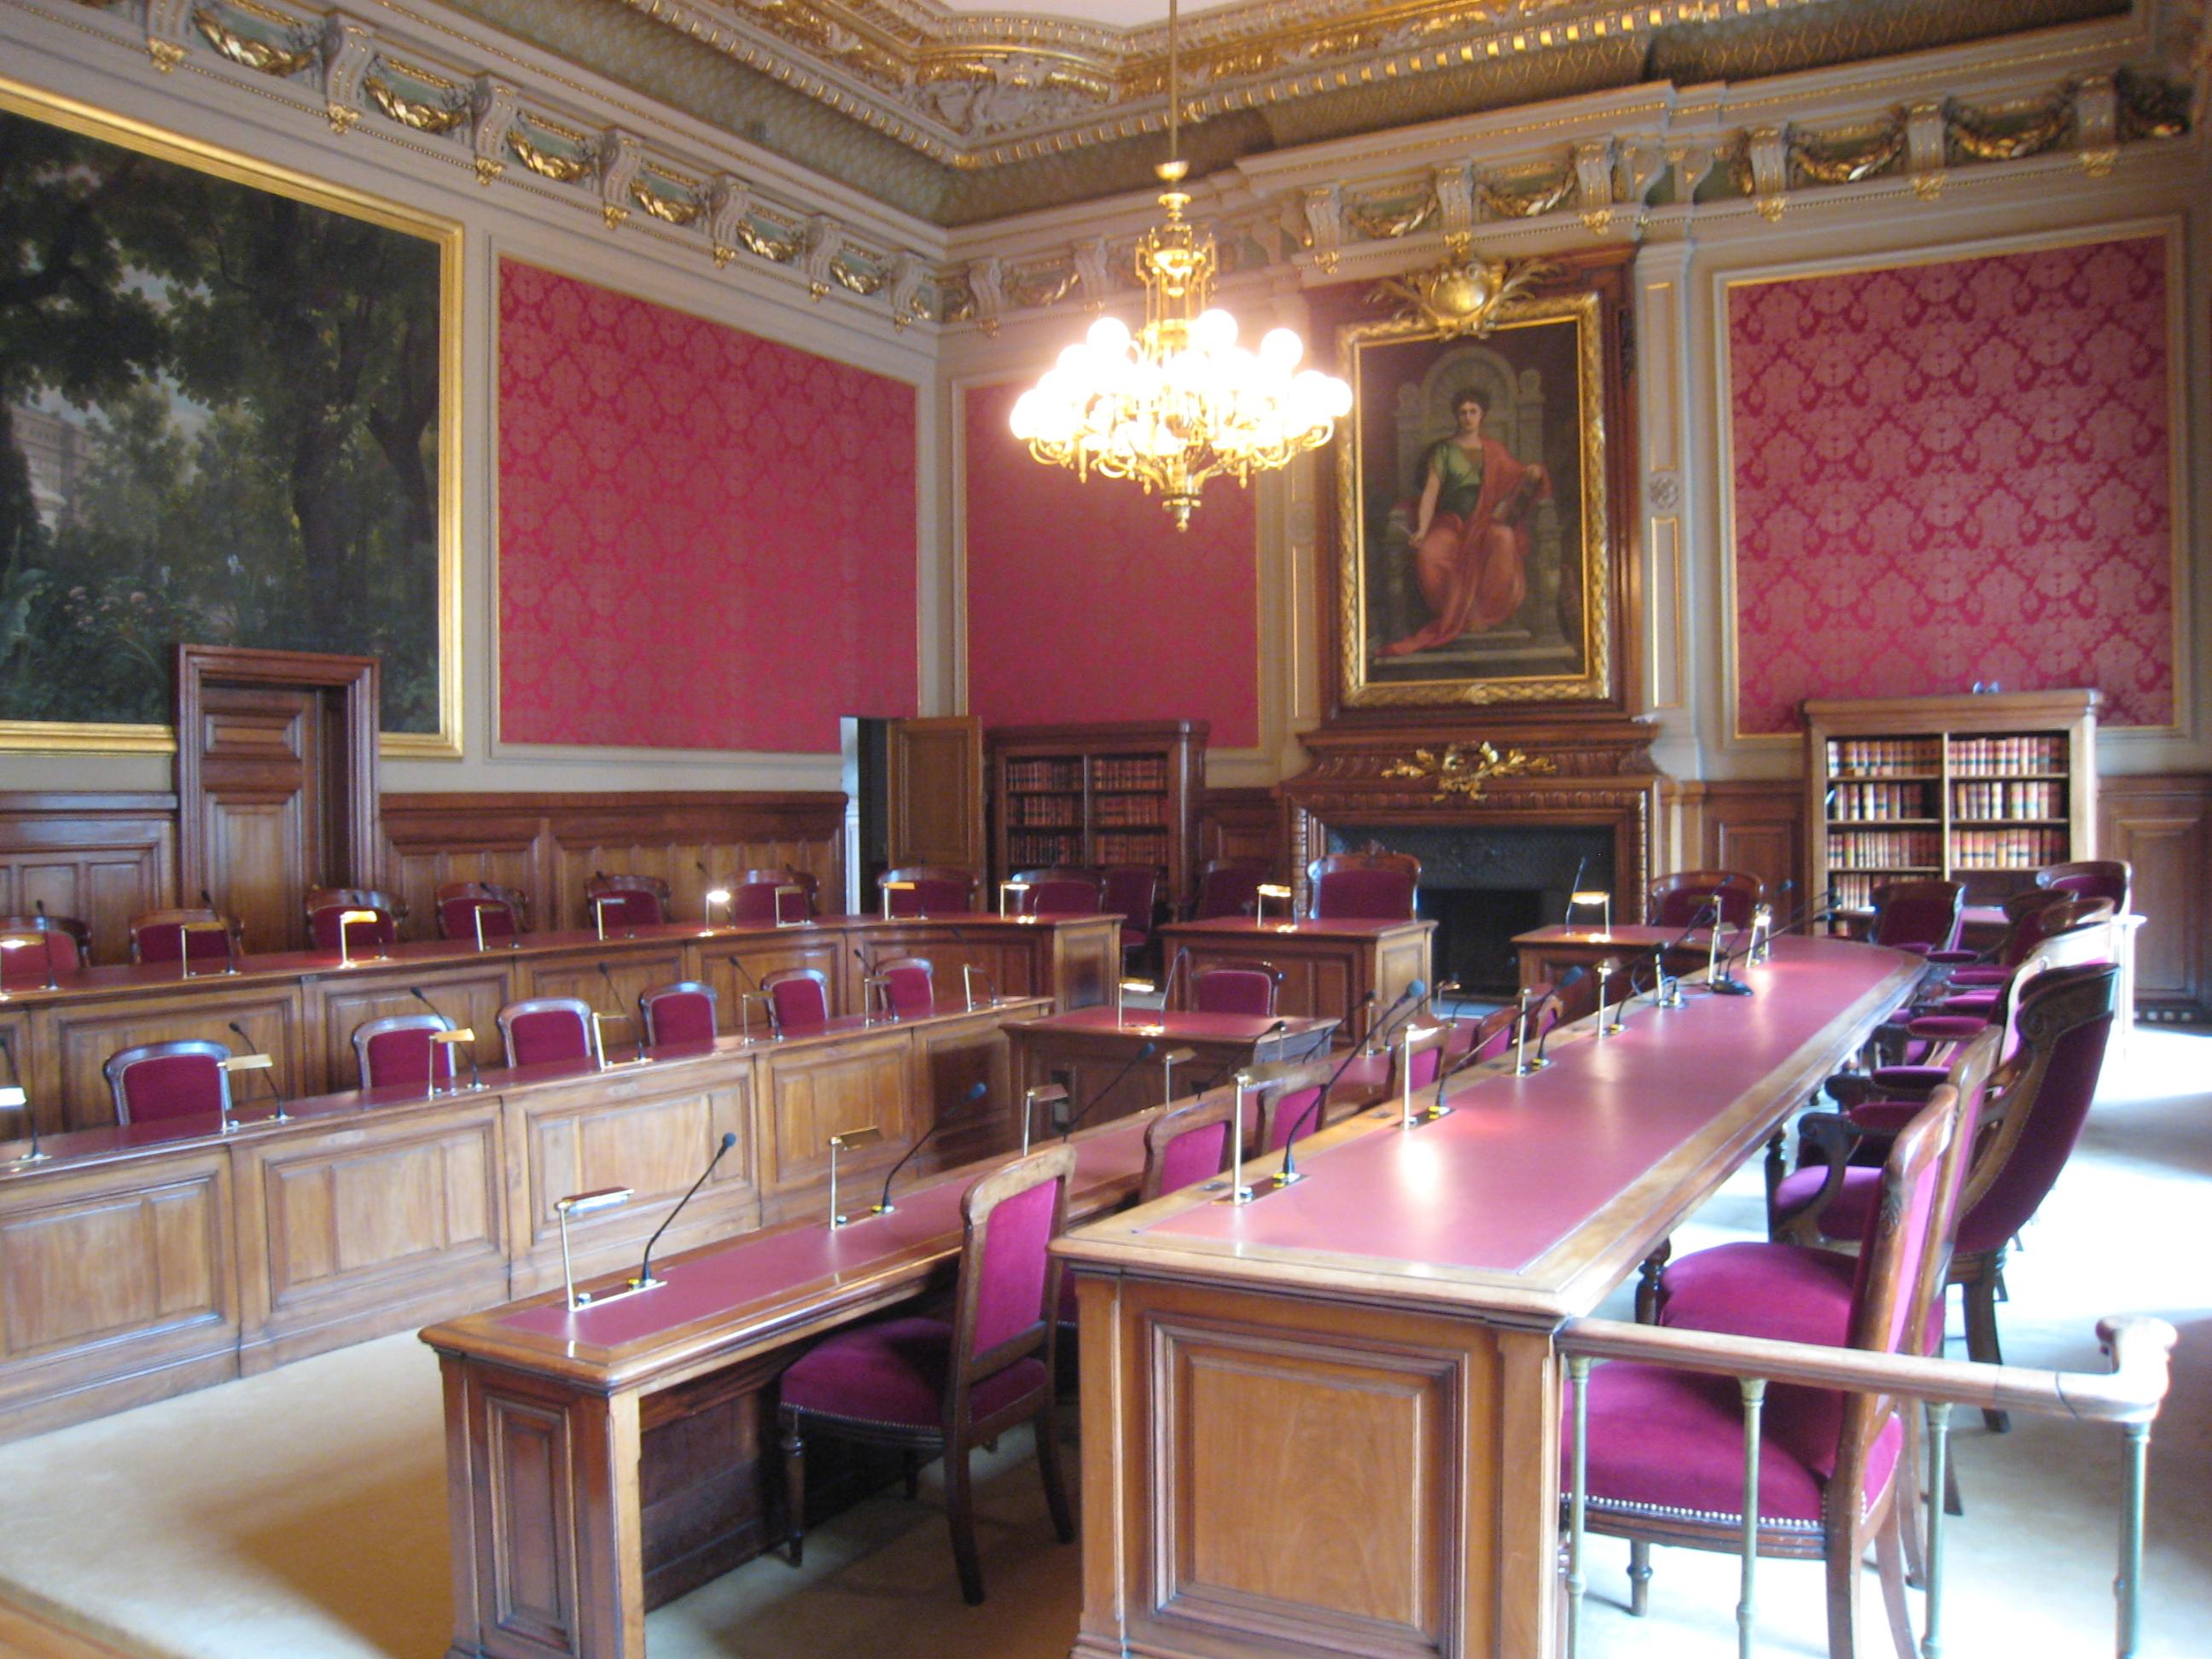 https commons wikimedia org wiki file conseil d 27 c3 89tat salle du contentieux jpg